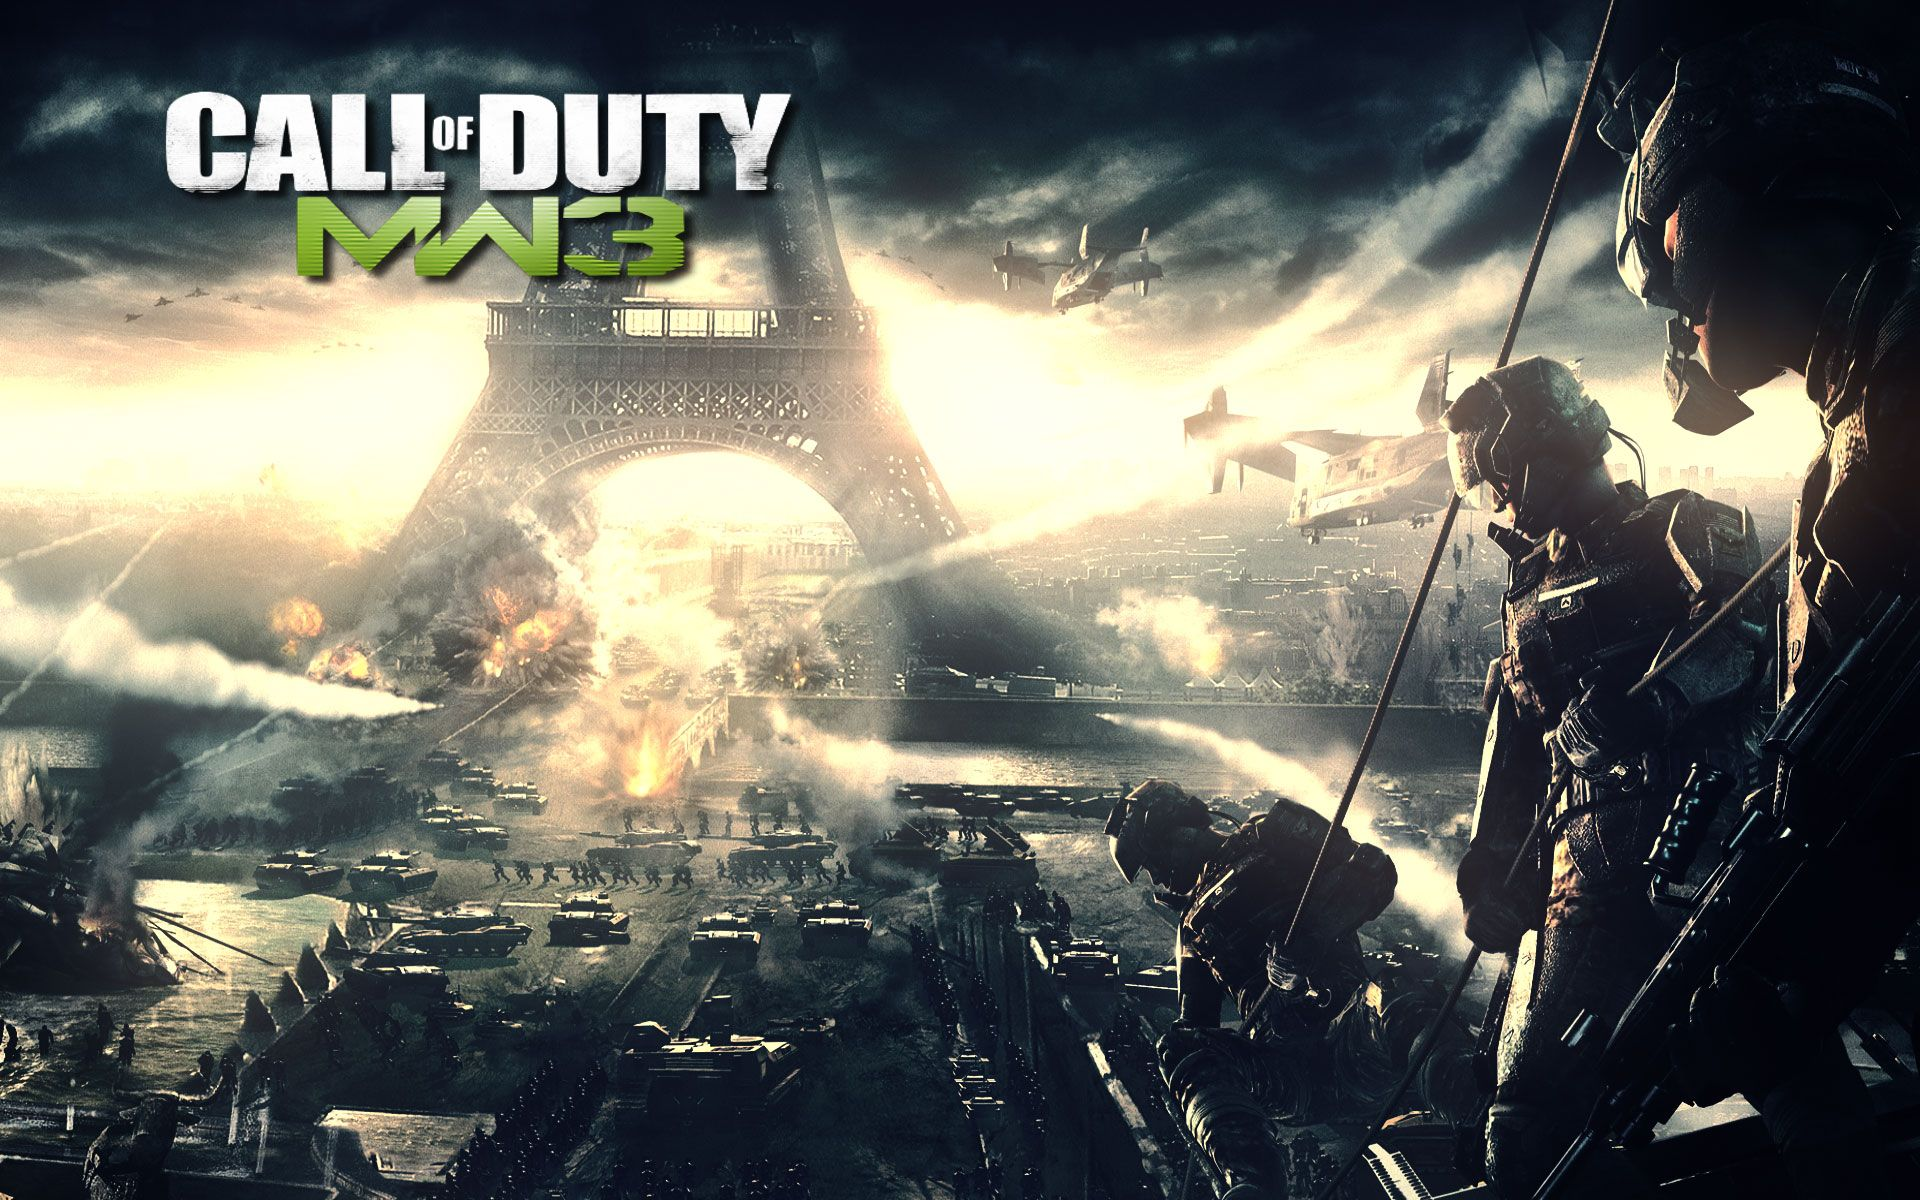 Call Of Duty Modern Warfare 3 Hd Call Of Duty Modern Warfare 3 Wallpapers Risen Sources Call Of Duty Modern Warfare Background Pictures